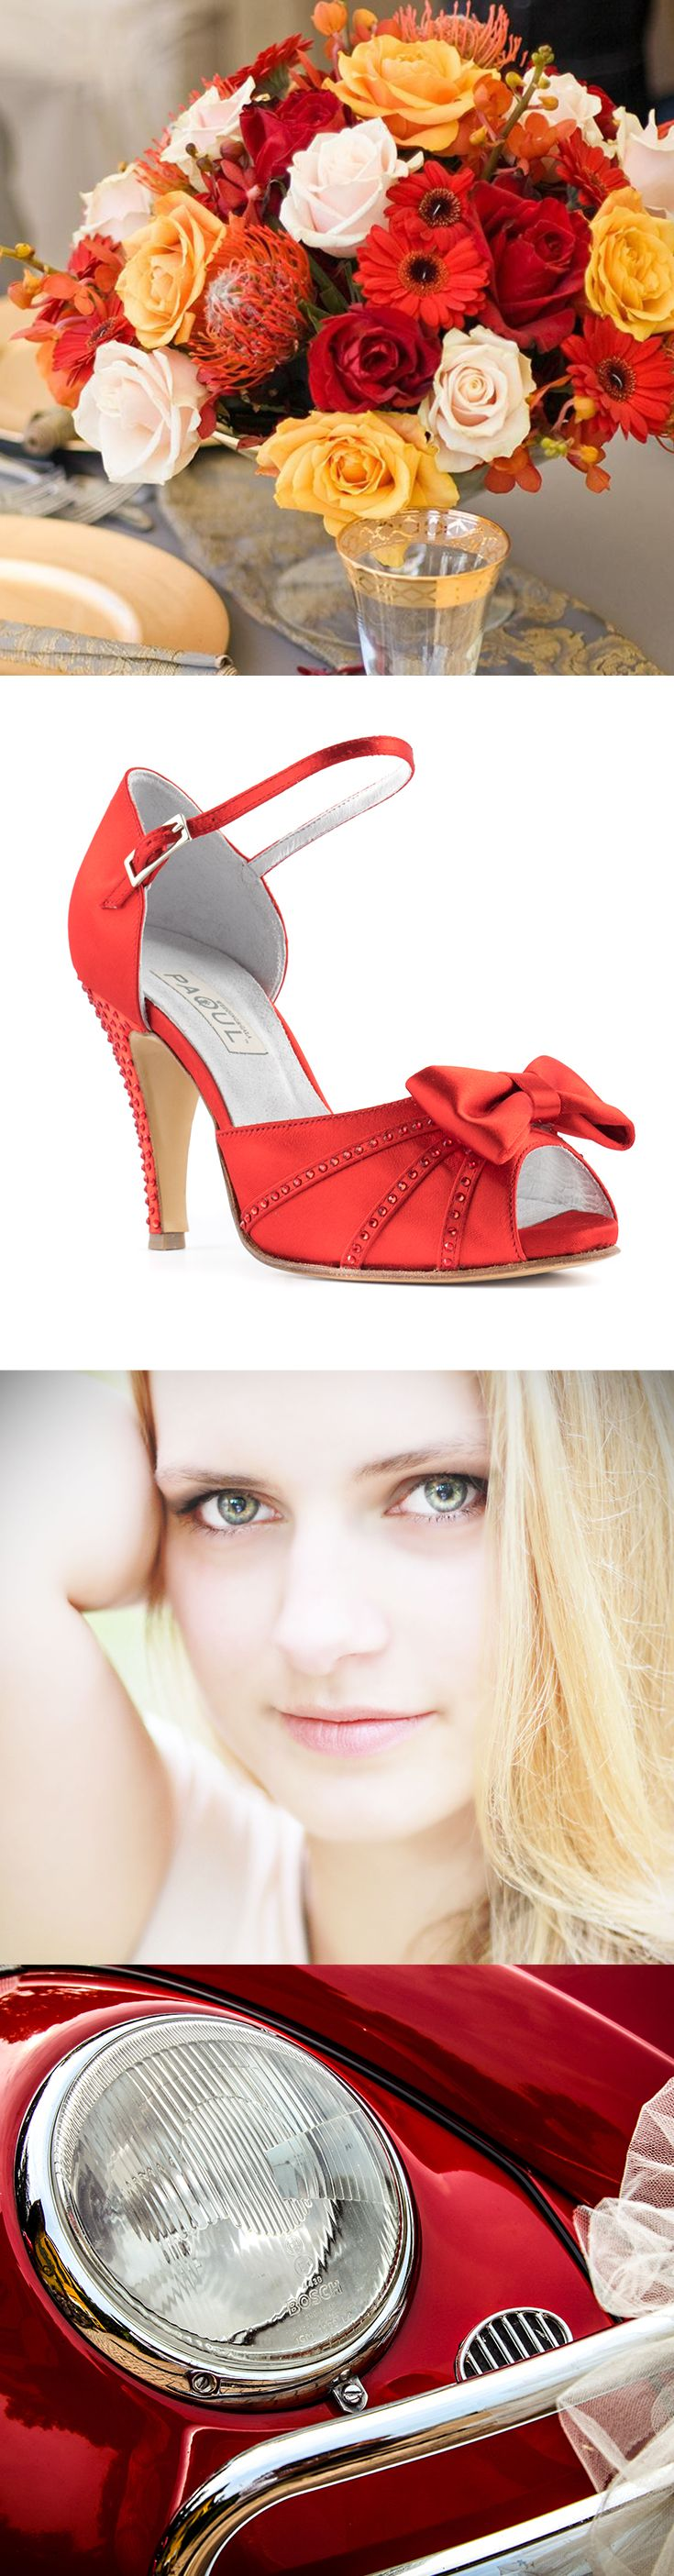 Emanuela, 25 anni, testimone di nozze, ha scelto la scarpa rossa ( 921_100I) della nuova linea Constellations. ----- Emanuela, 25 years old, maid of honor, chose the red shoe (921_100I) from the new Constellations line. ----- #Paoul #matrimonio #wedding #scarpedasposa #weddingshoes #sposa #bride #bridalshoes #bridal #nozze